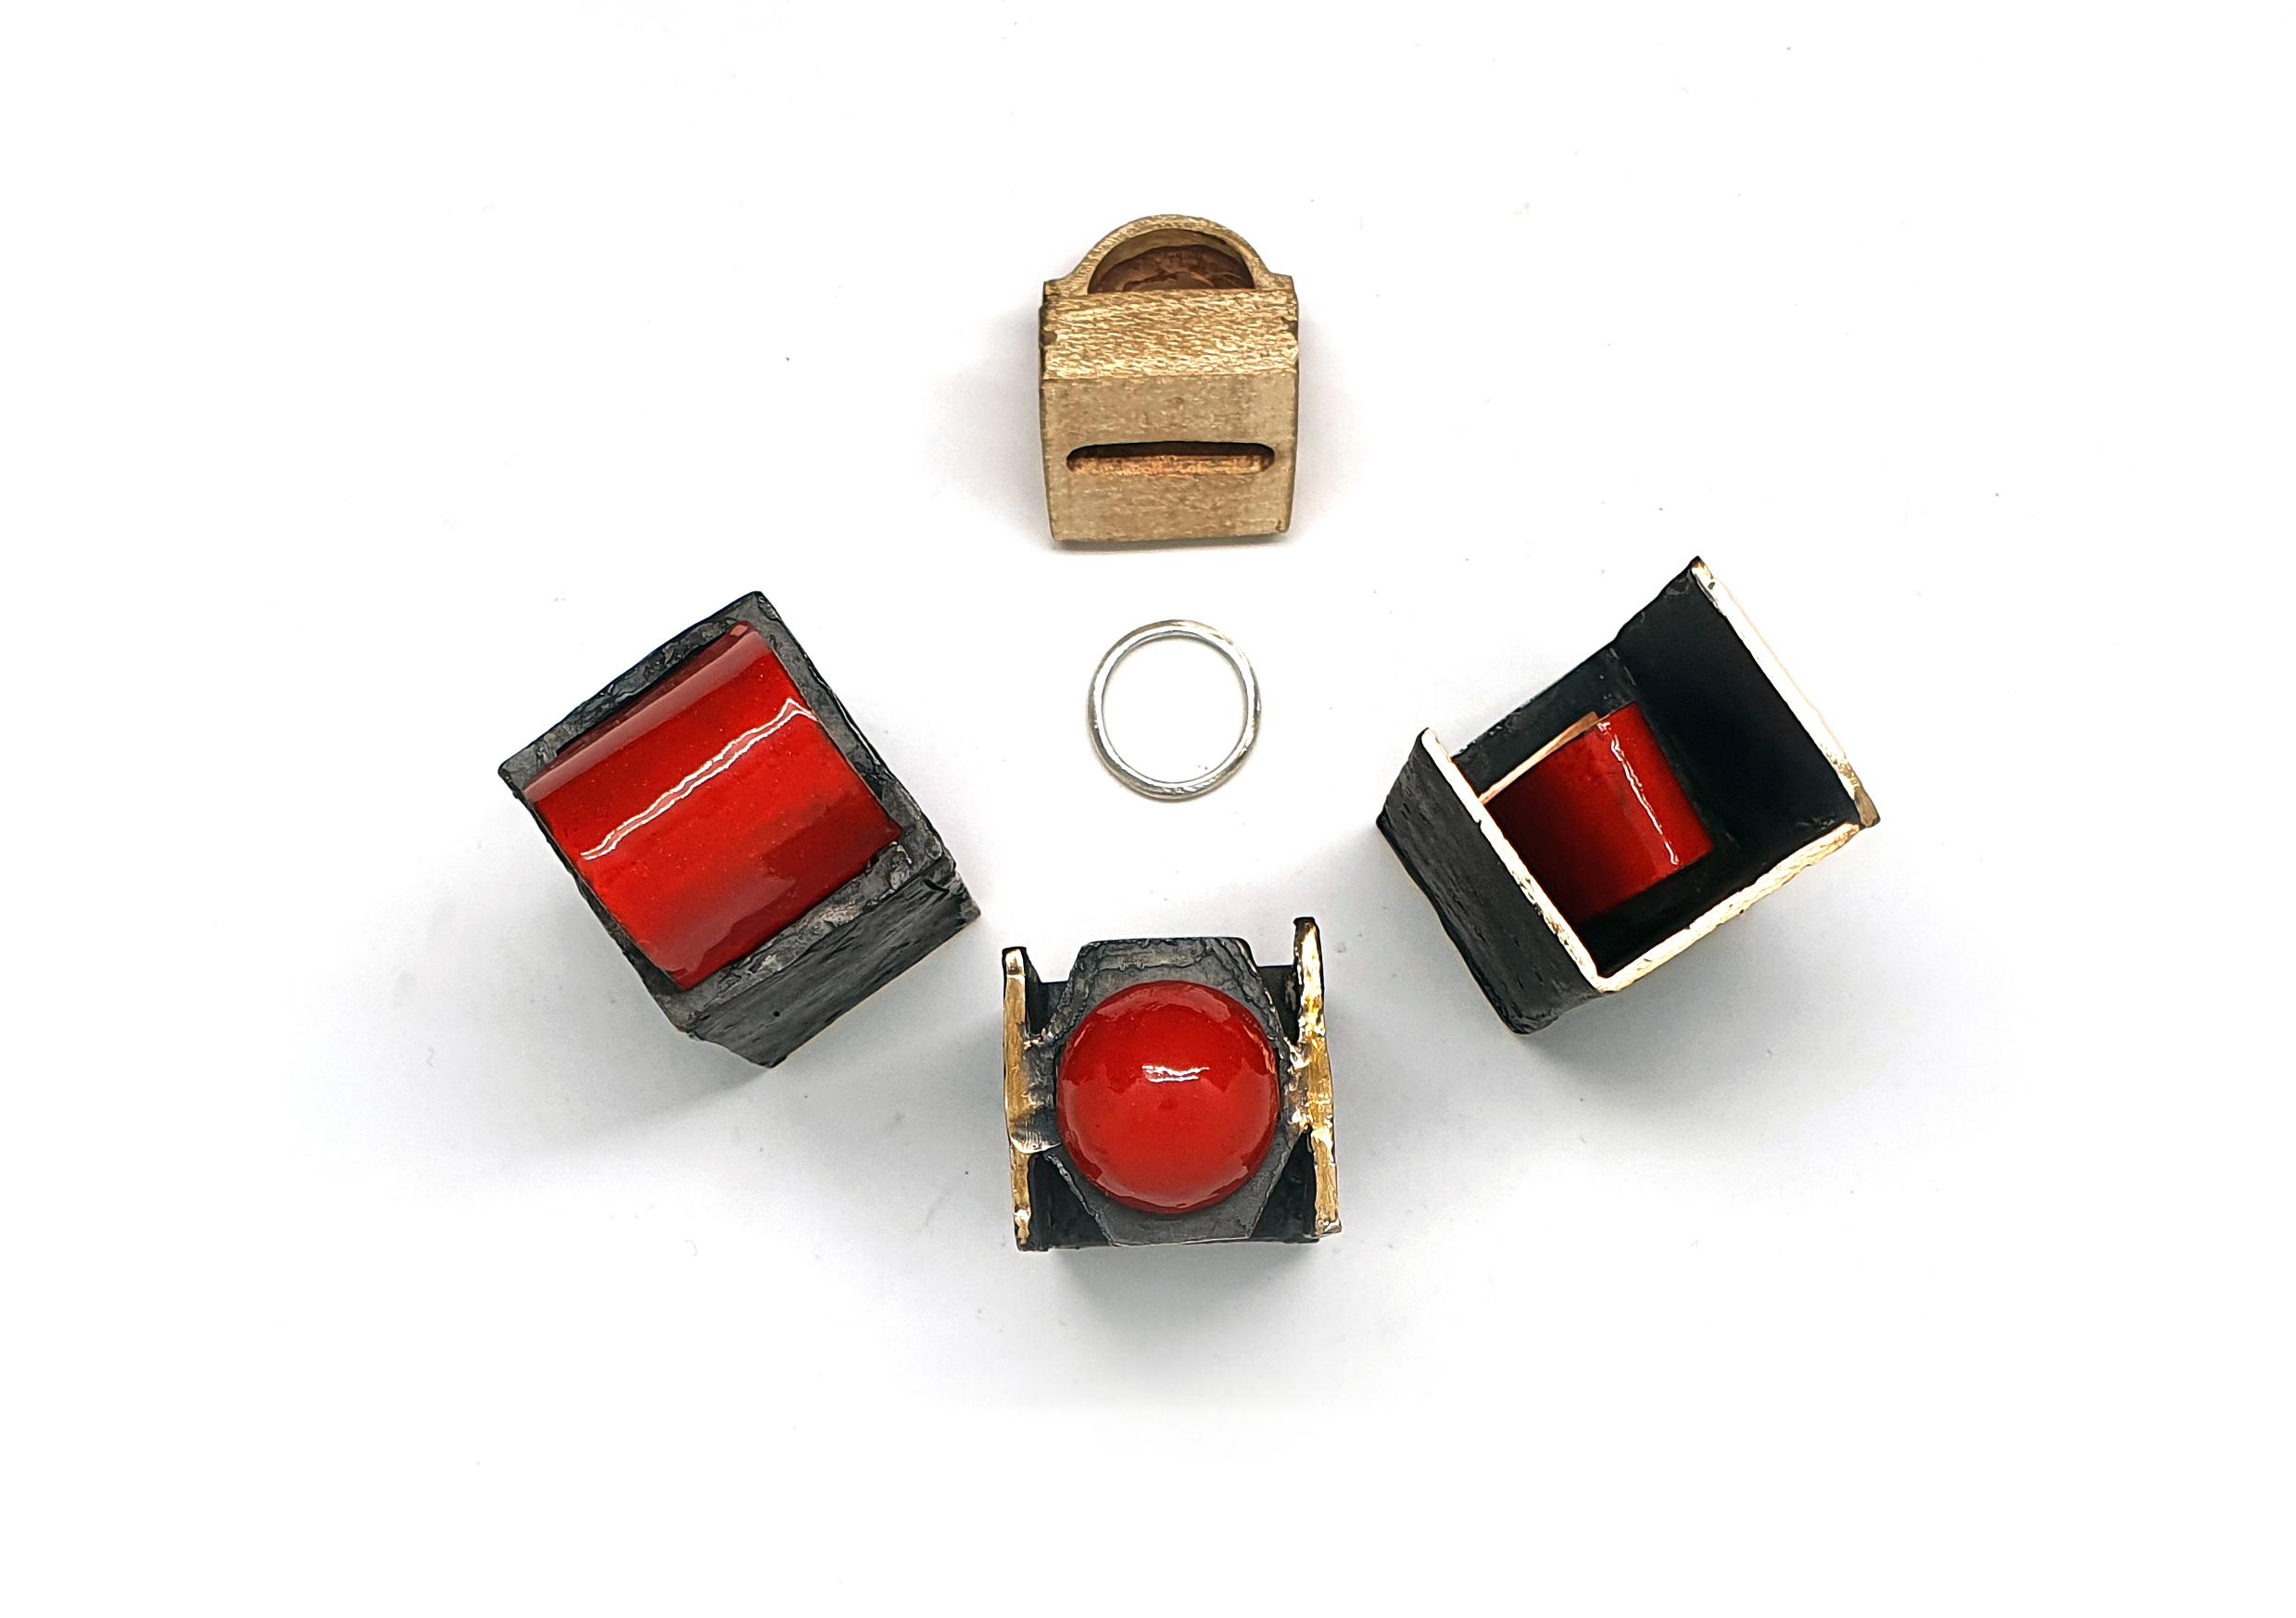 engelzita_ring_houseringtogether_2020_bronze_silver_90x35x35mm_2